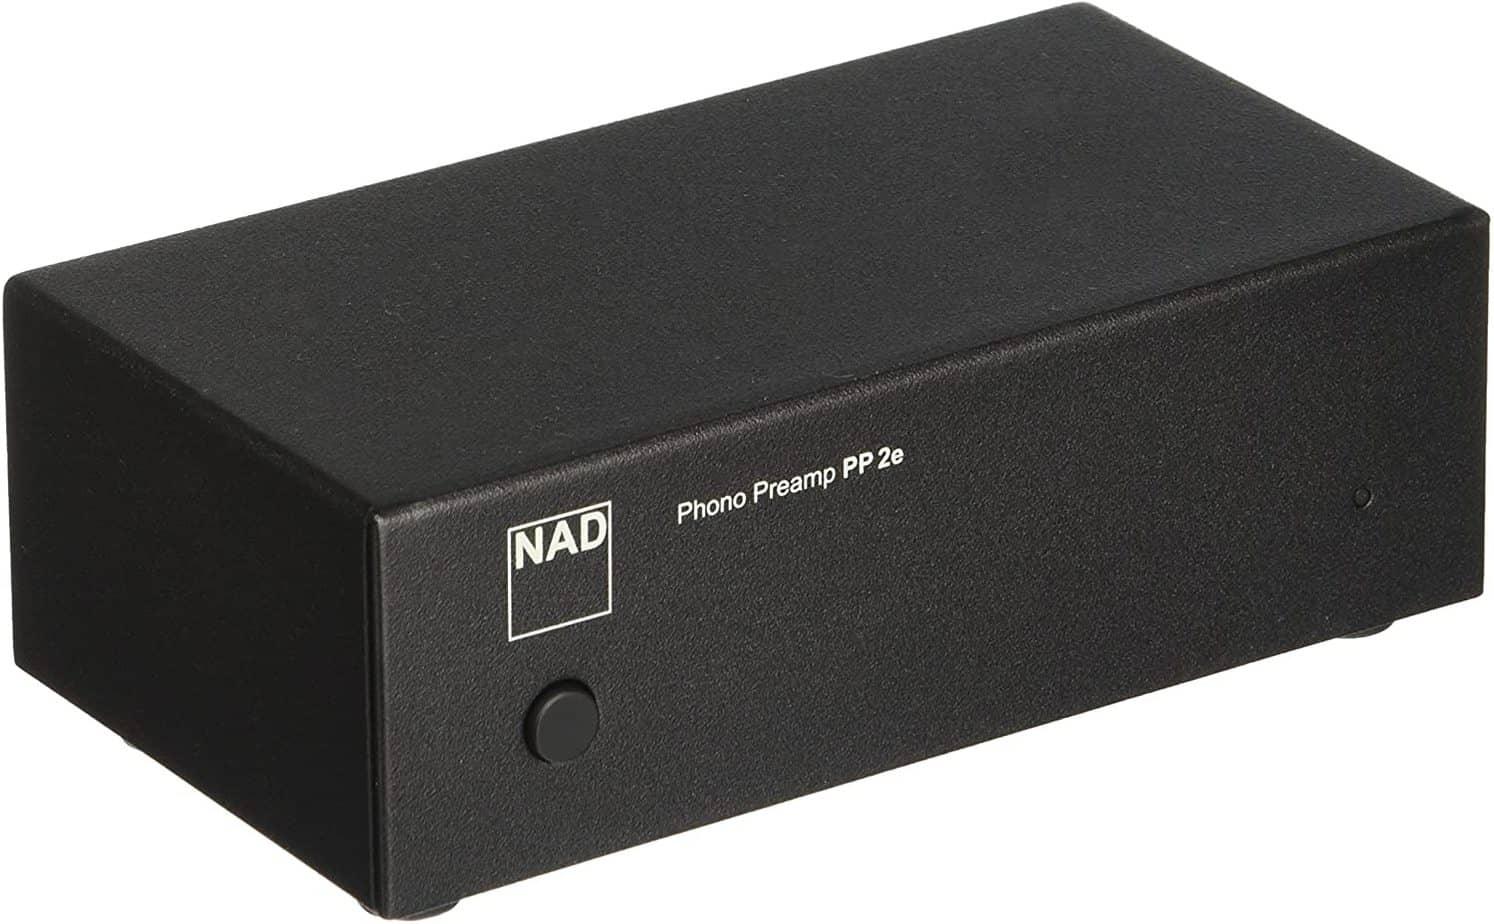 NAD PP 2e Phono Preamplifier